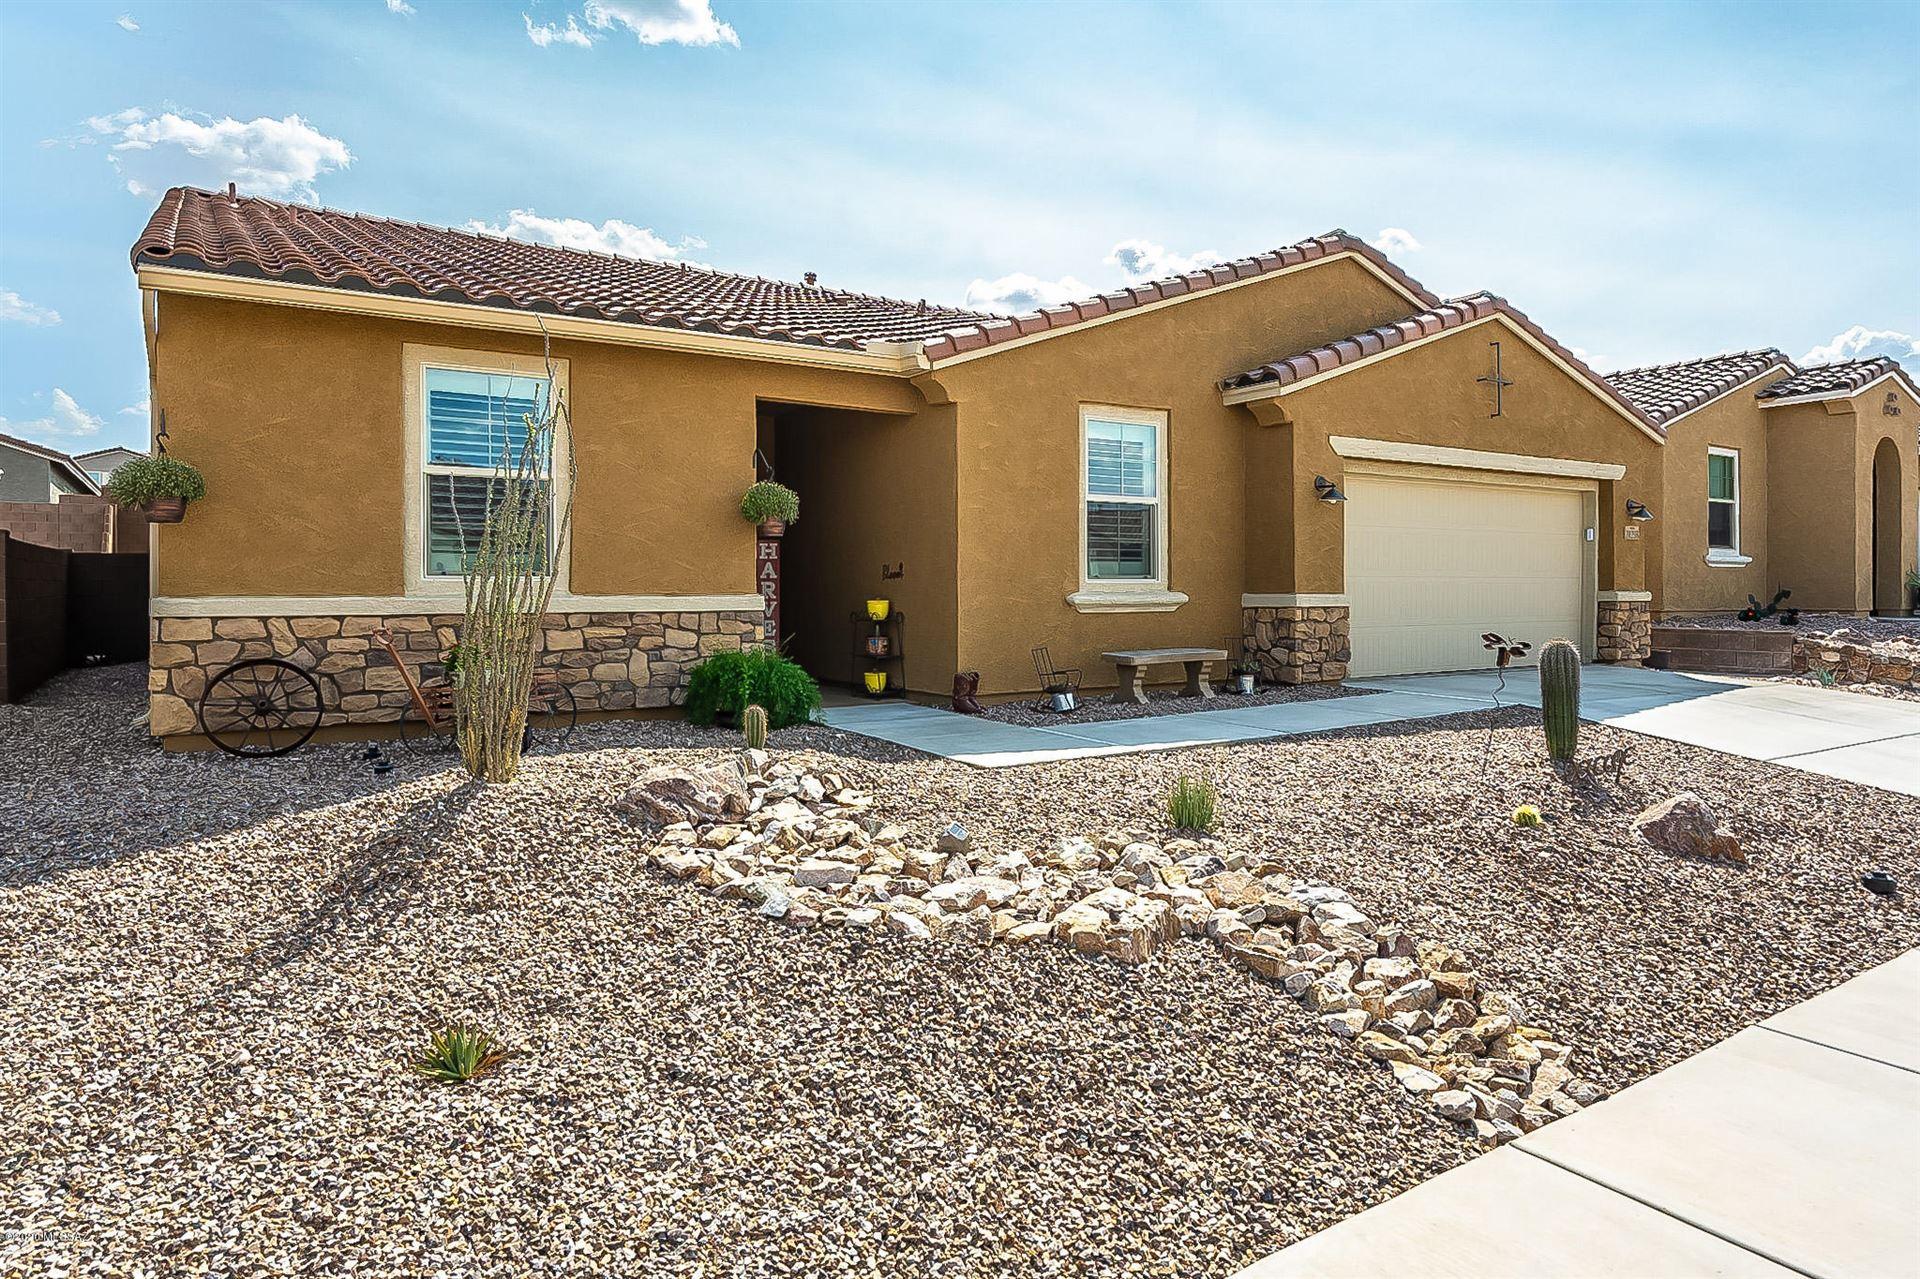 10256 E Iron Horse Trail, Tucson, AZ 85747 - MLS#: 22023332